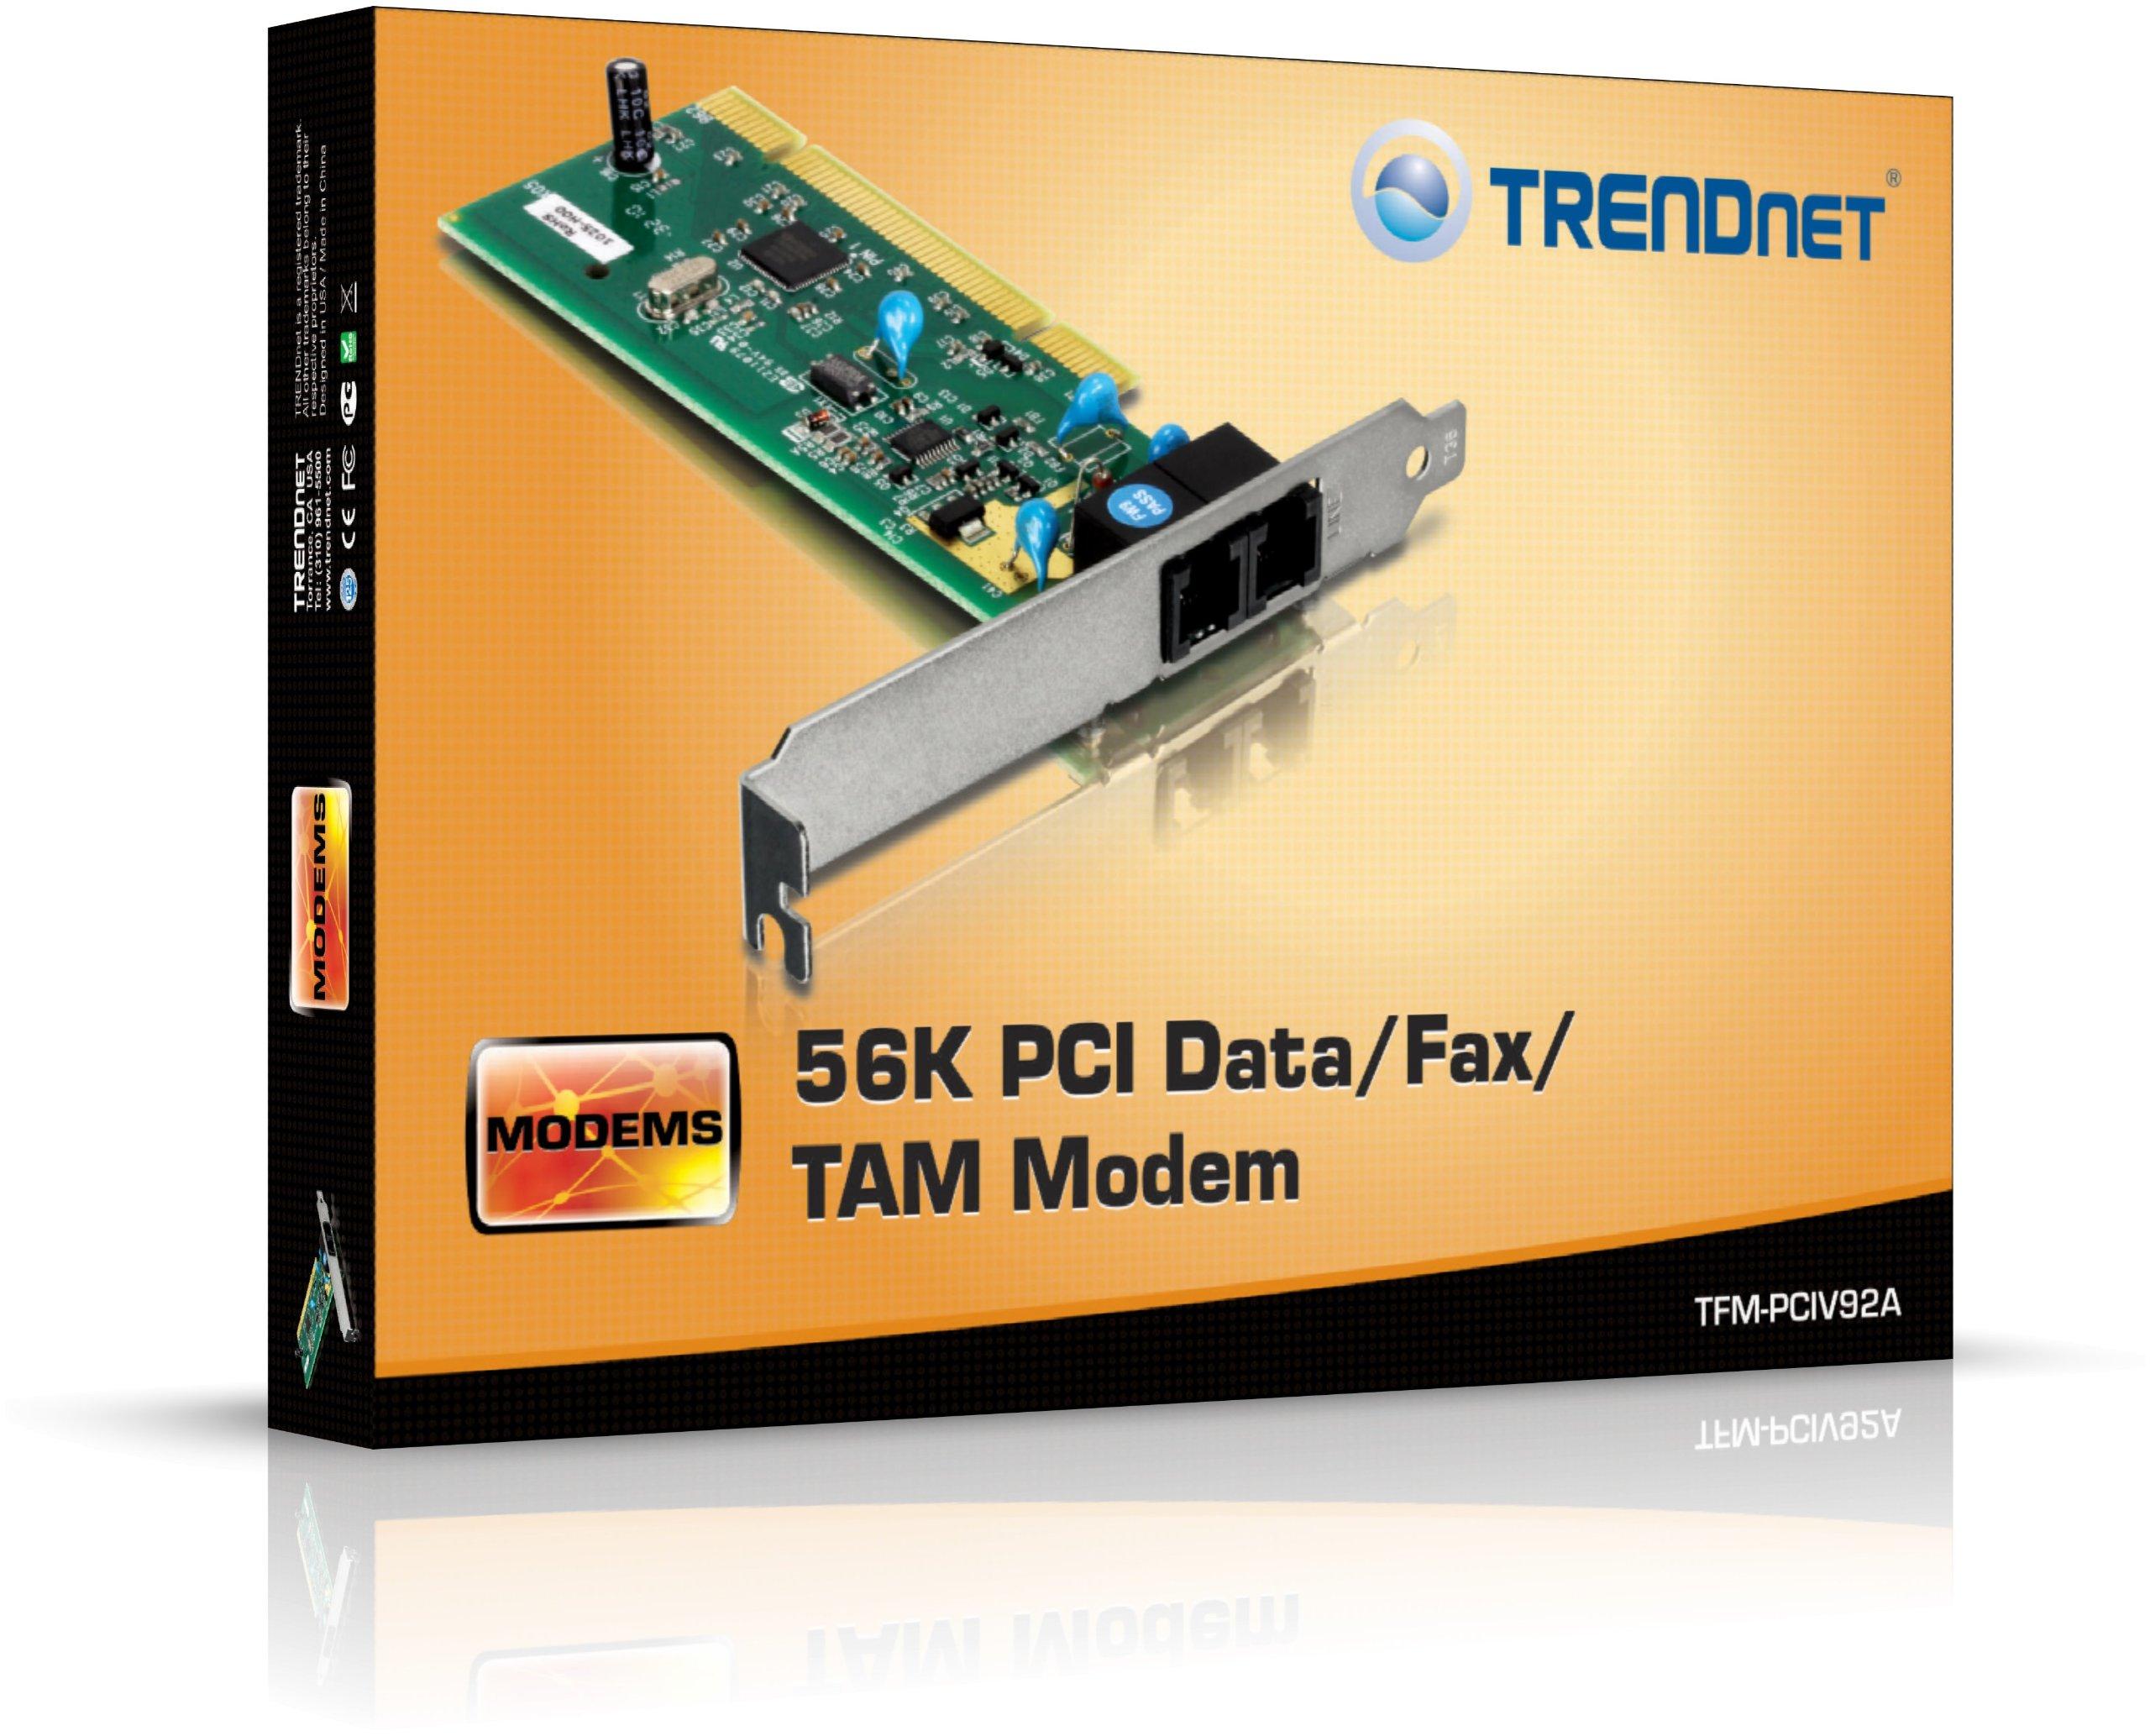 TRENDnet 56K Internal PCI Data,Fax and TAM Modem, TFM-PCIV92A by TRENDnet